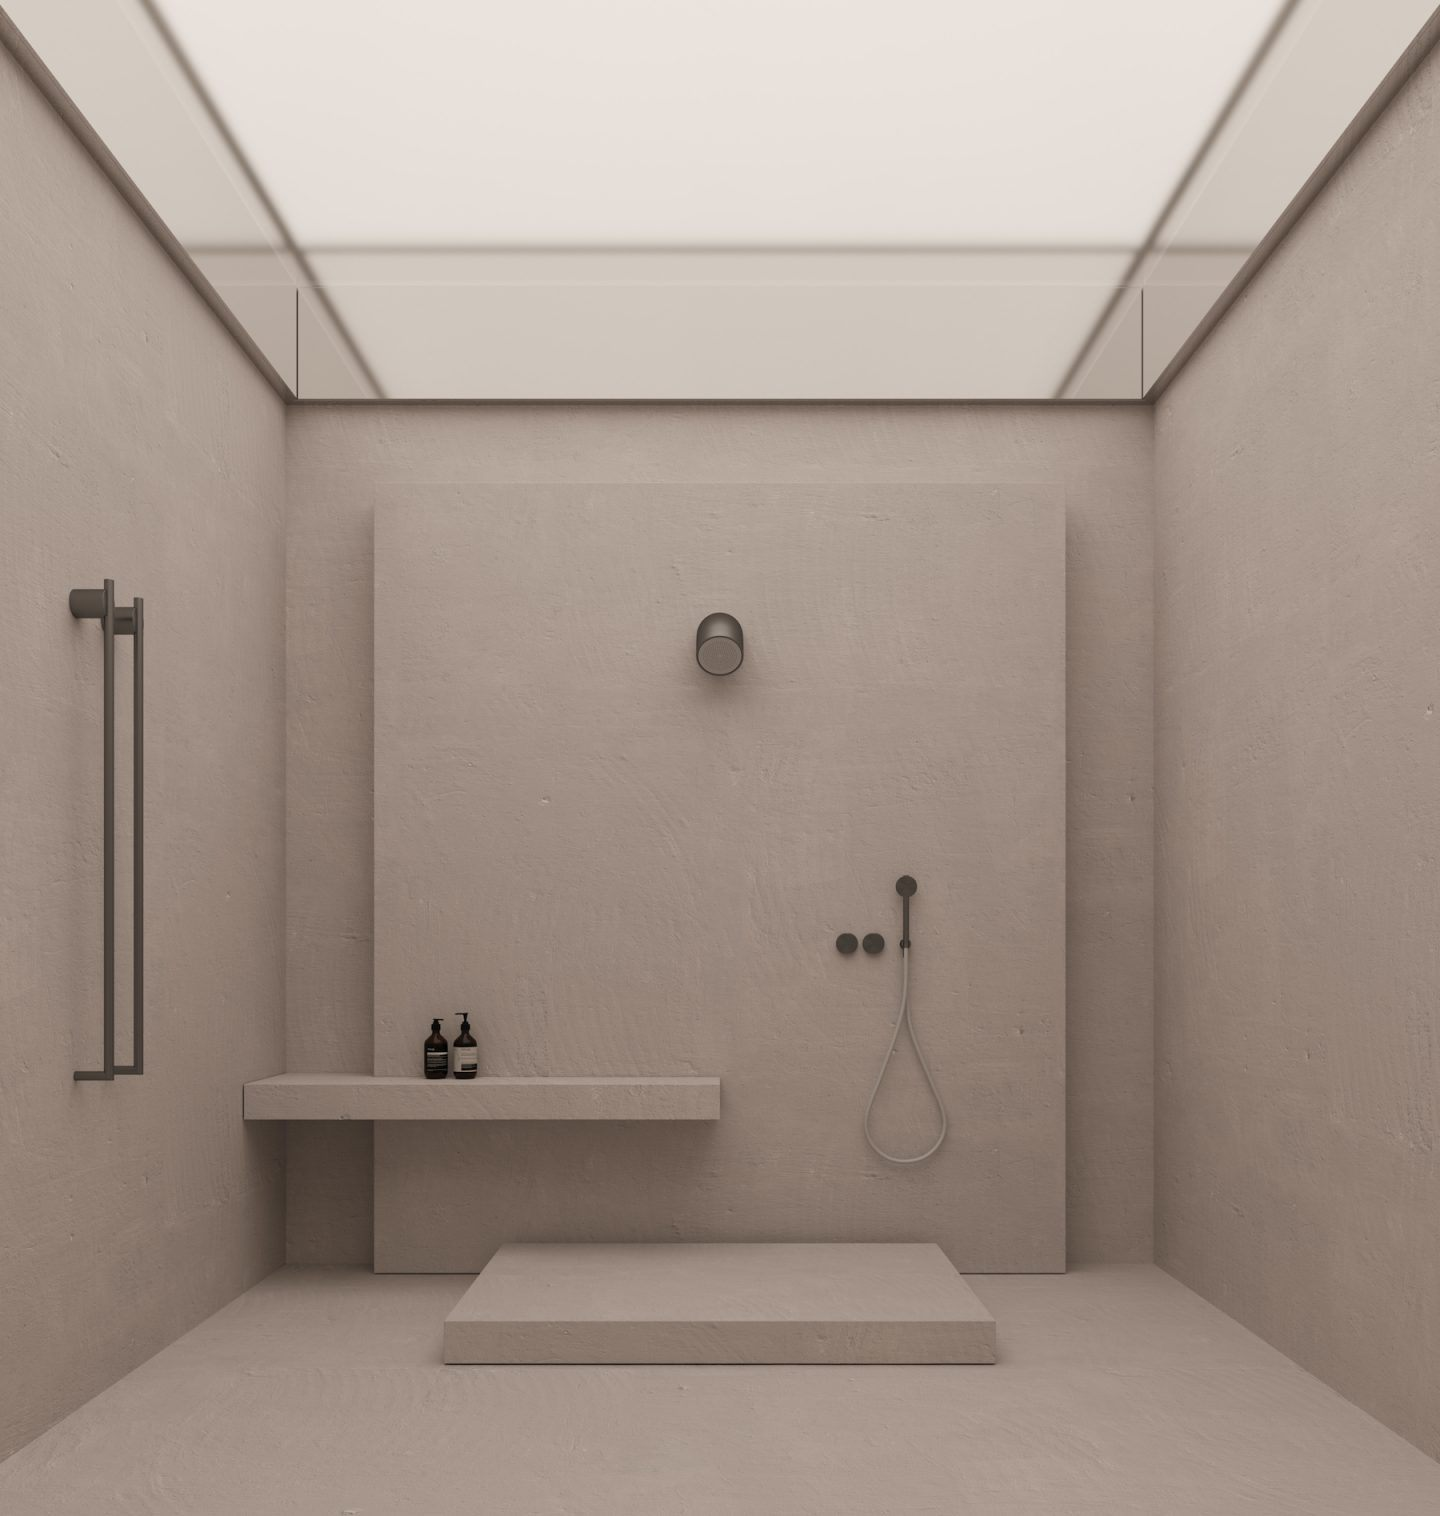 IGNANT-Design-Kanstantsin-Remez-II-Introvert-Residence-019